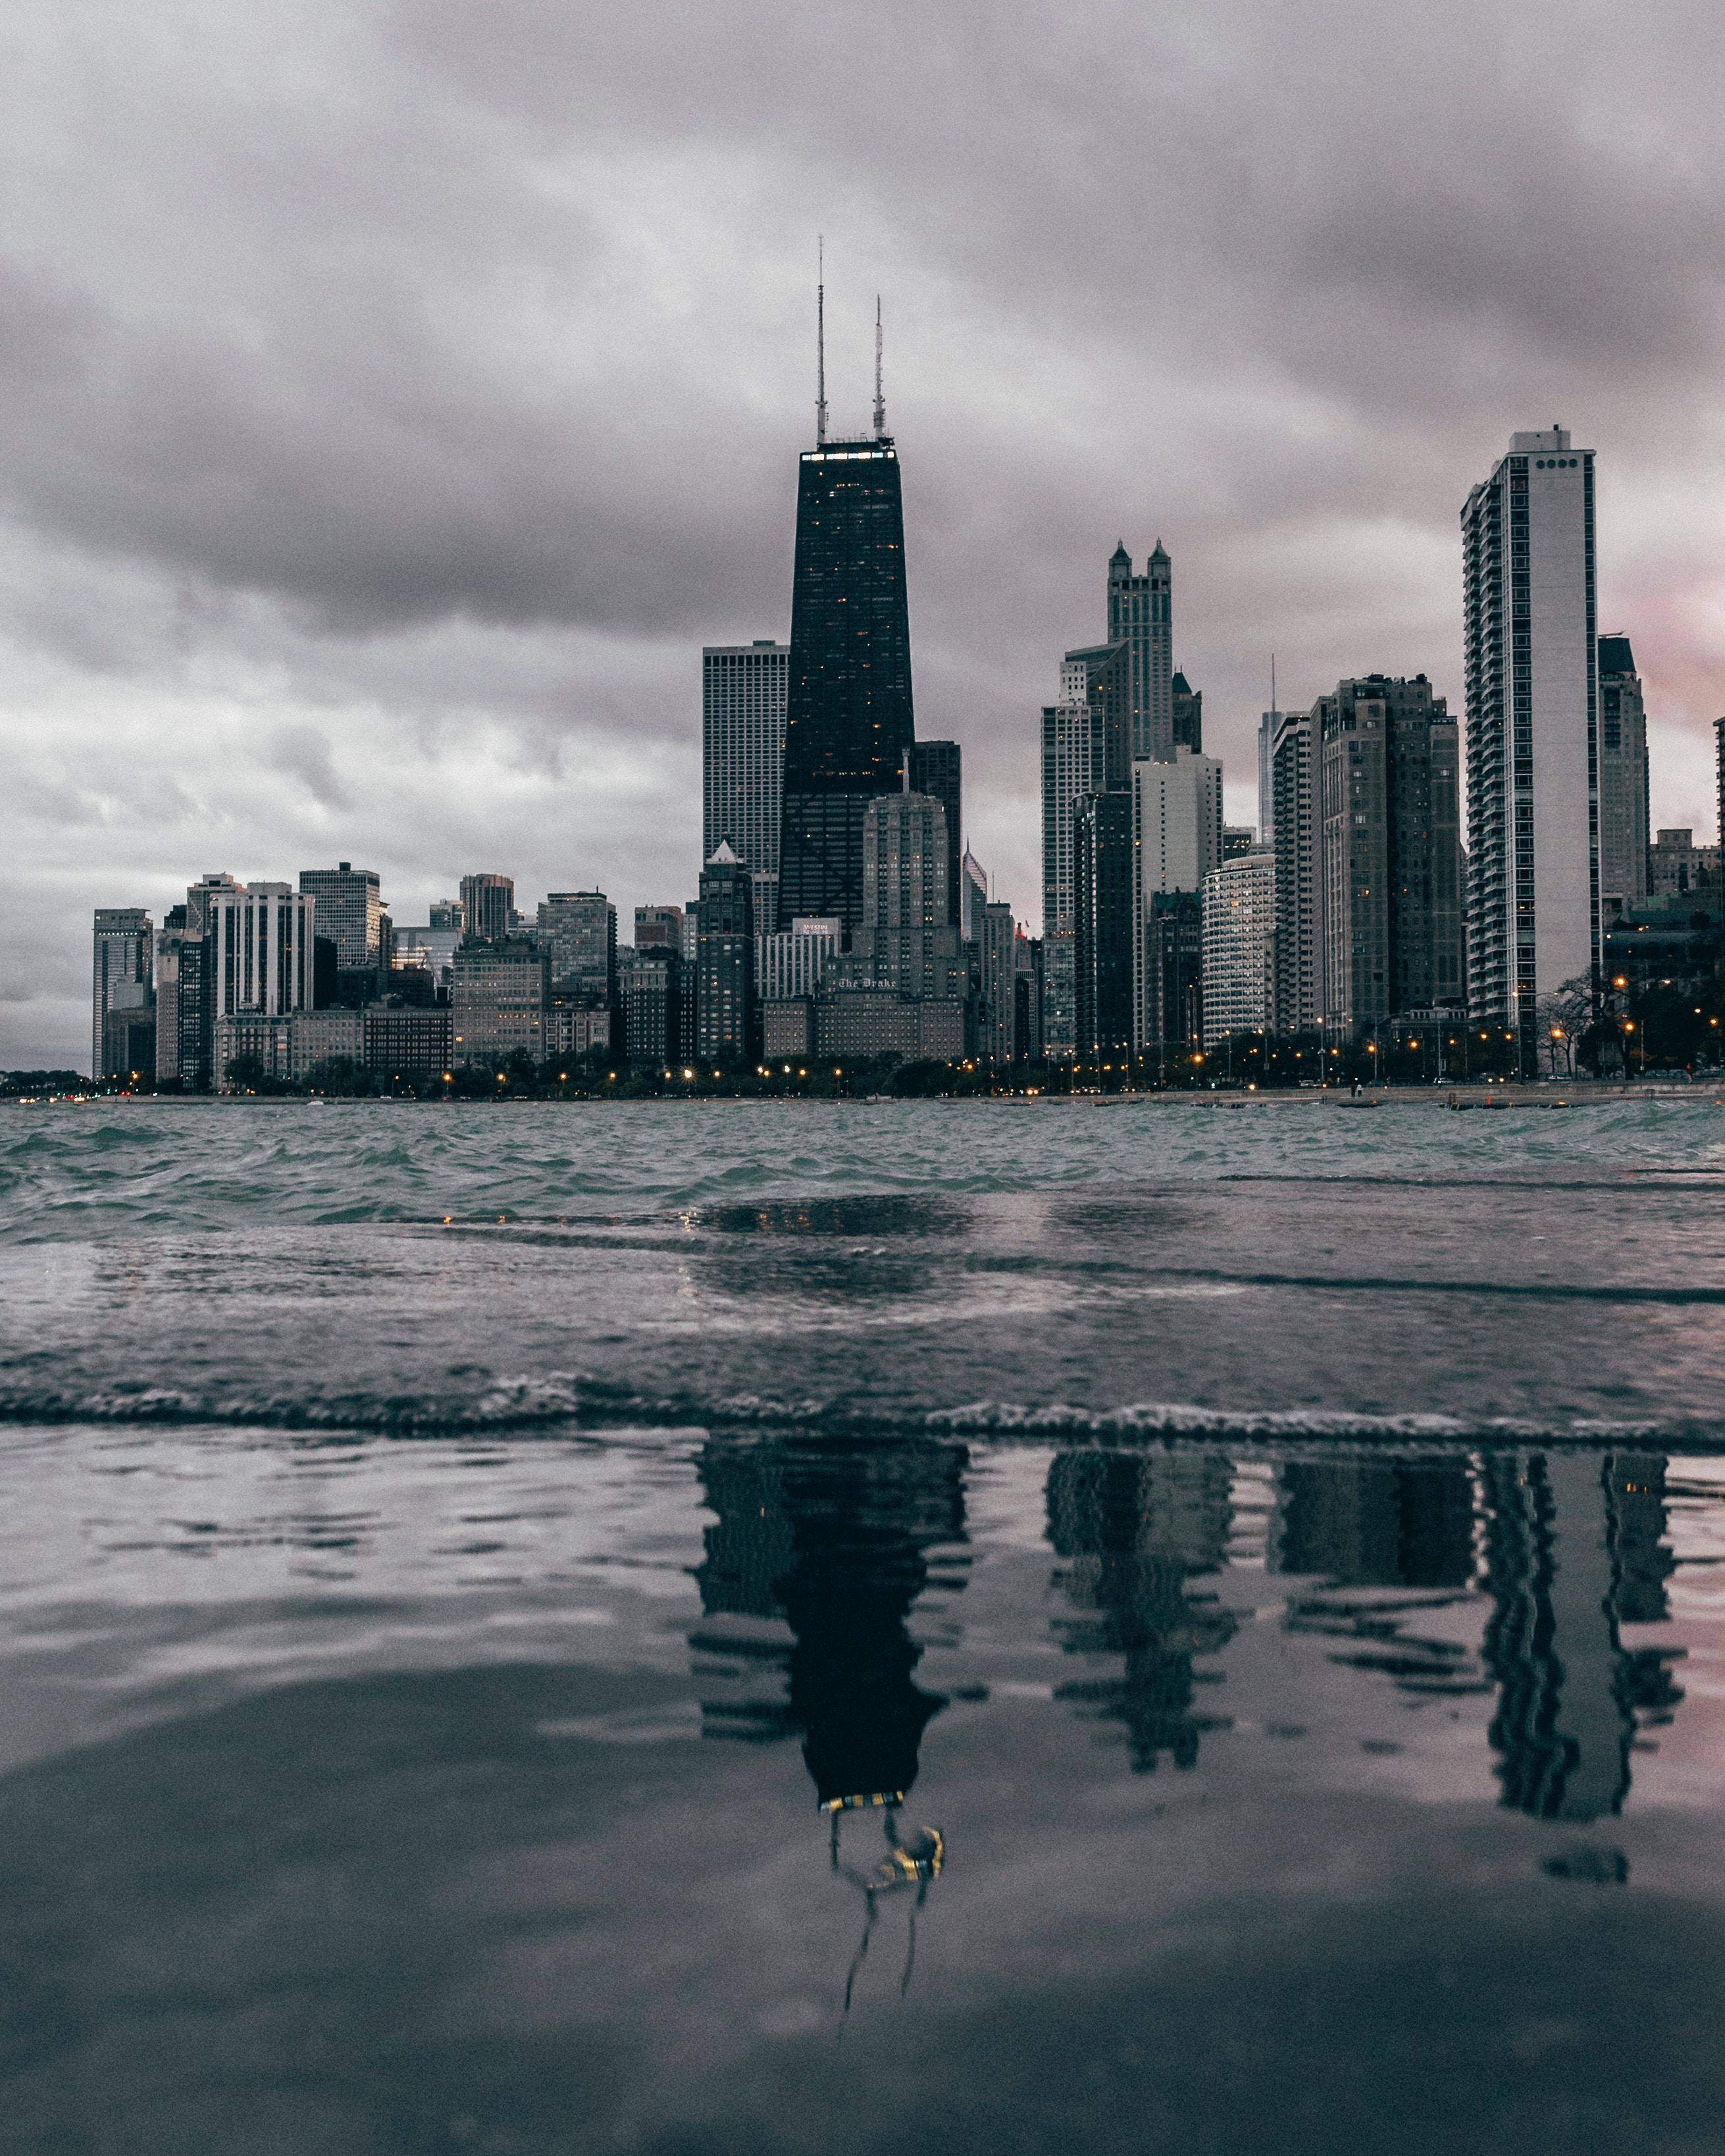 Chicago_from_lake_victor-lozano.jpg